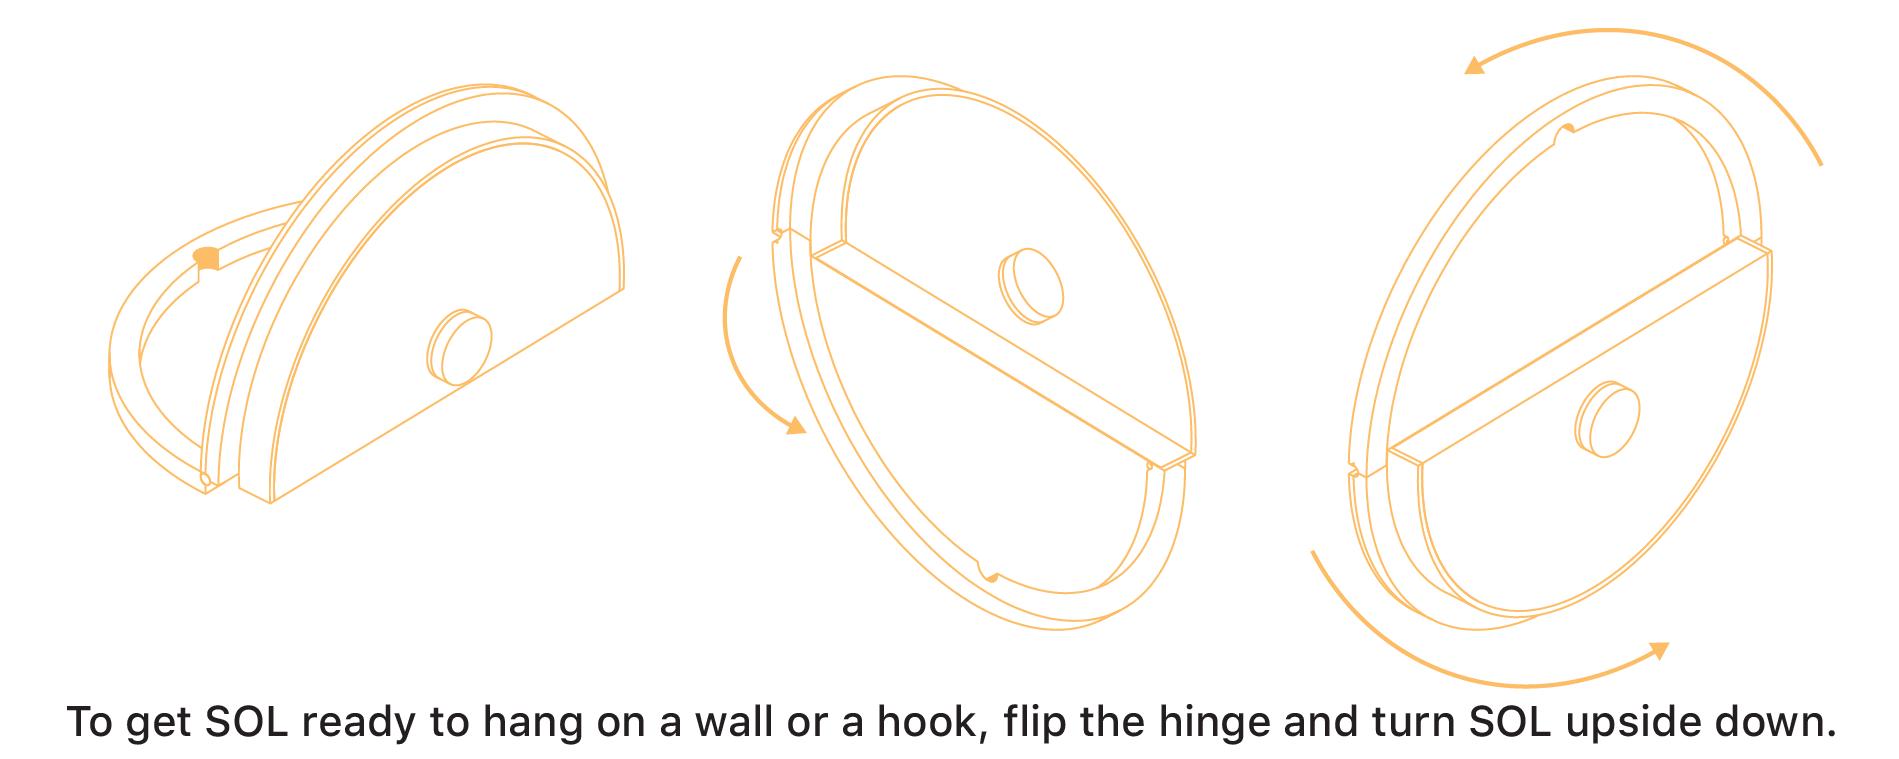 instructions-021